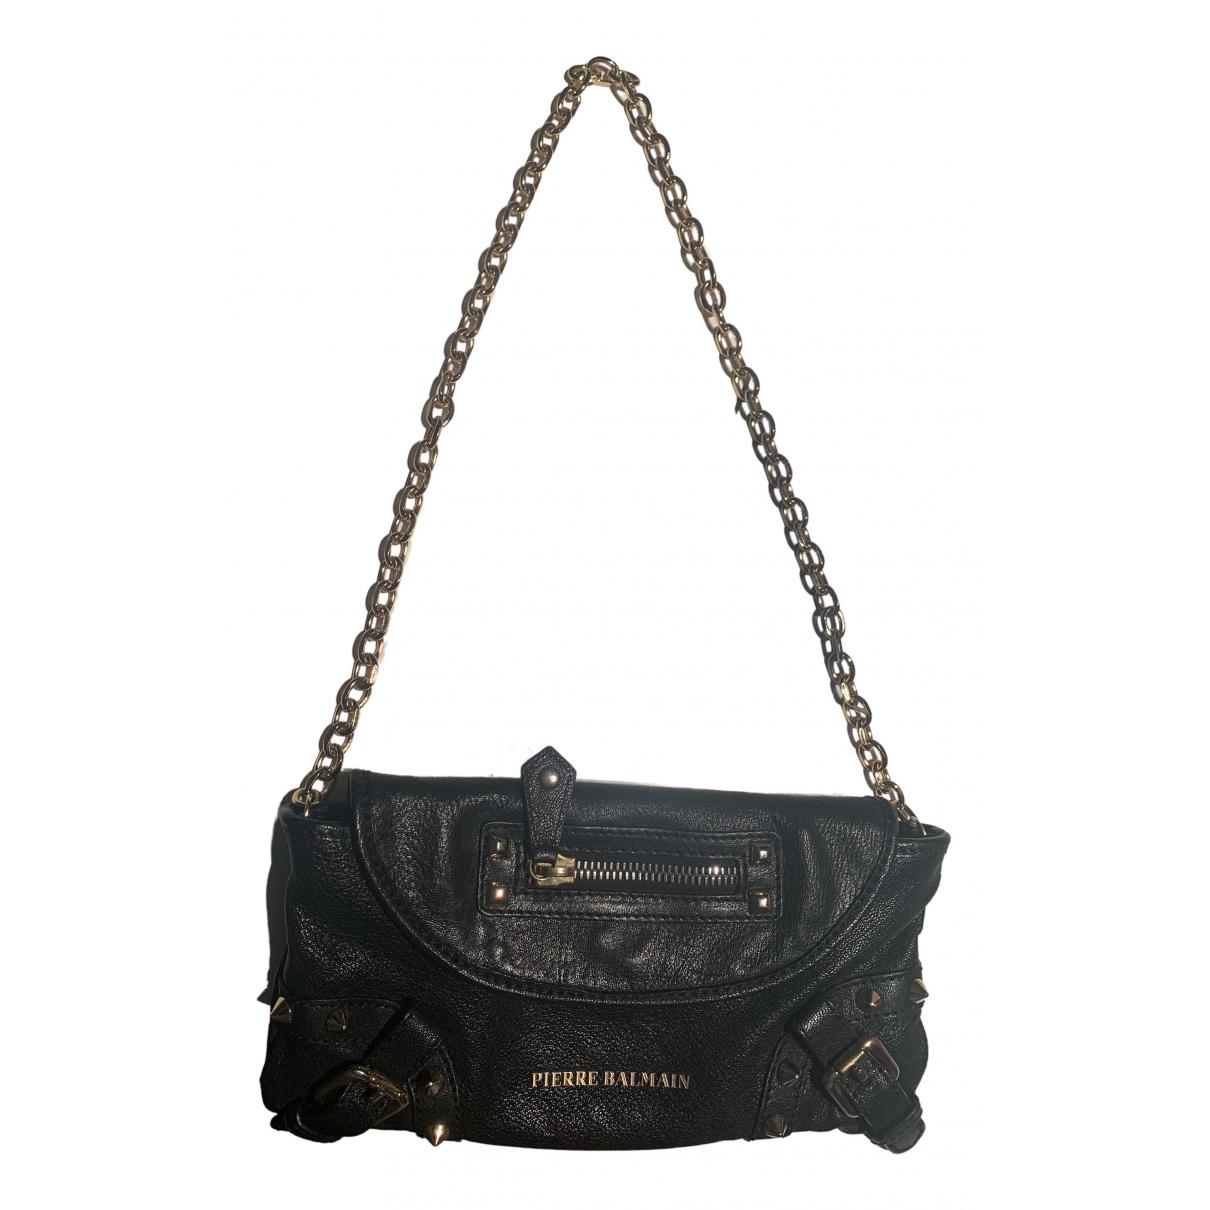 Pierre Balmain \N Black Leather Clutch bag for Women \N